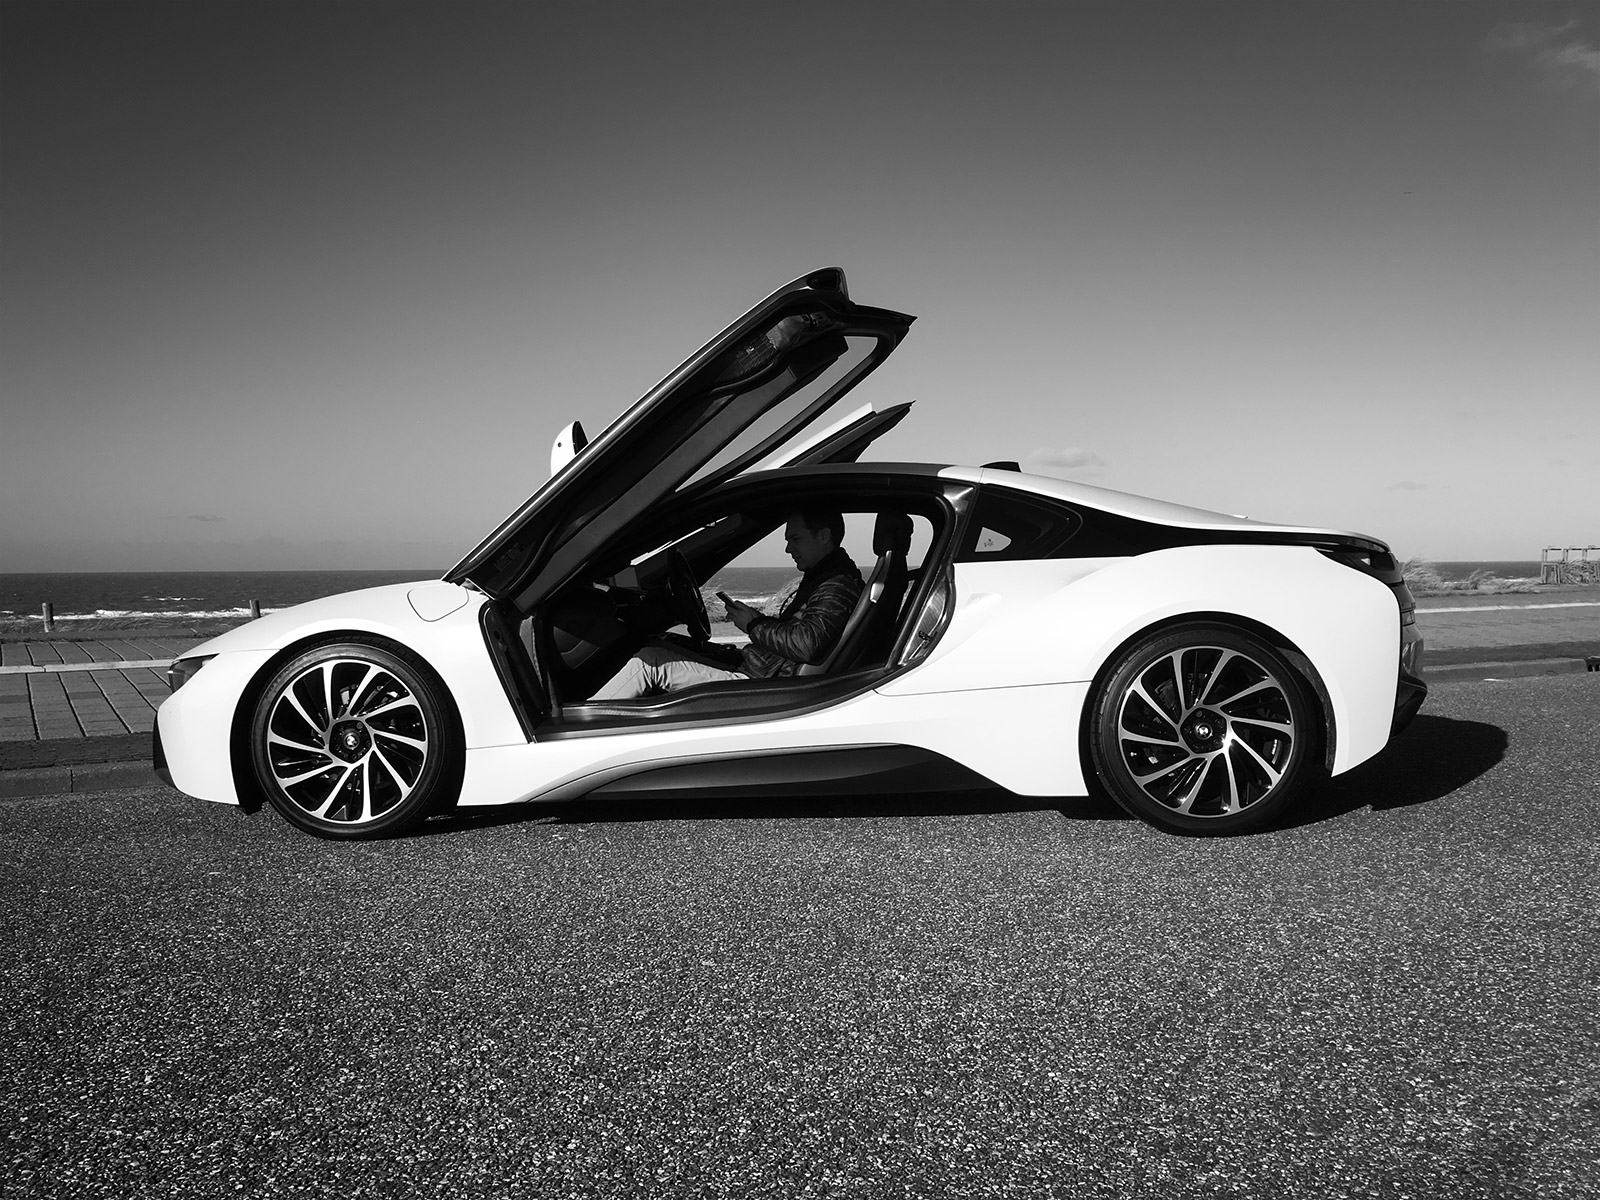 BMW-i8-Sander-van-der-Heide-zw1